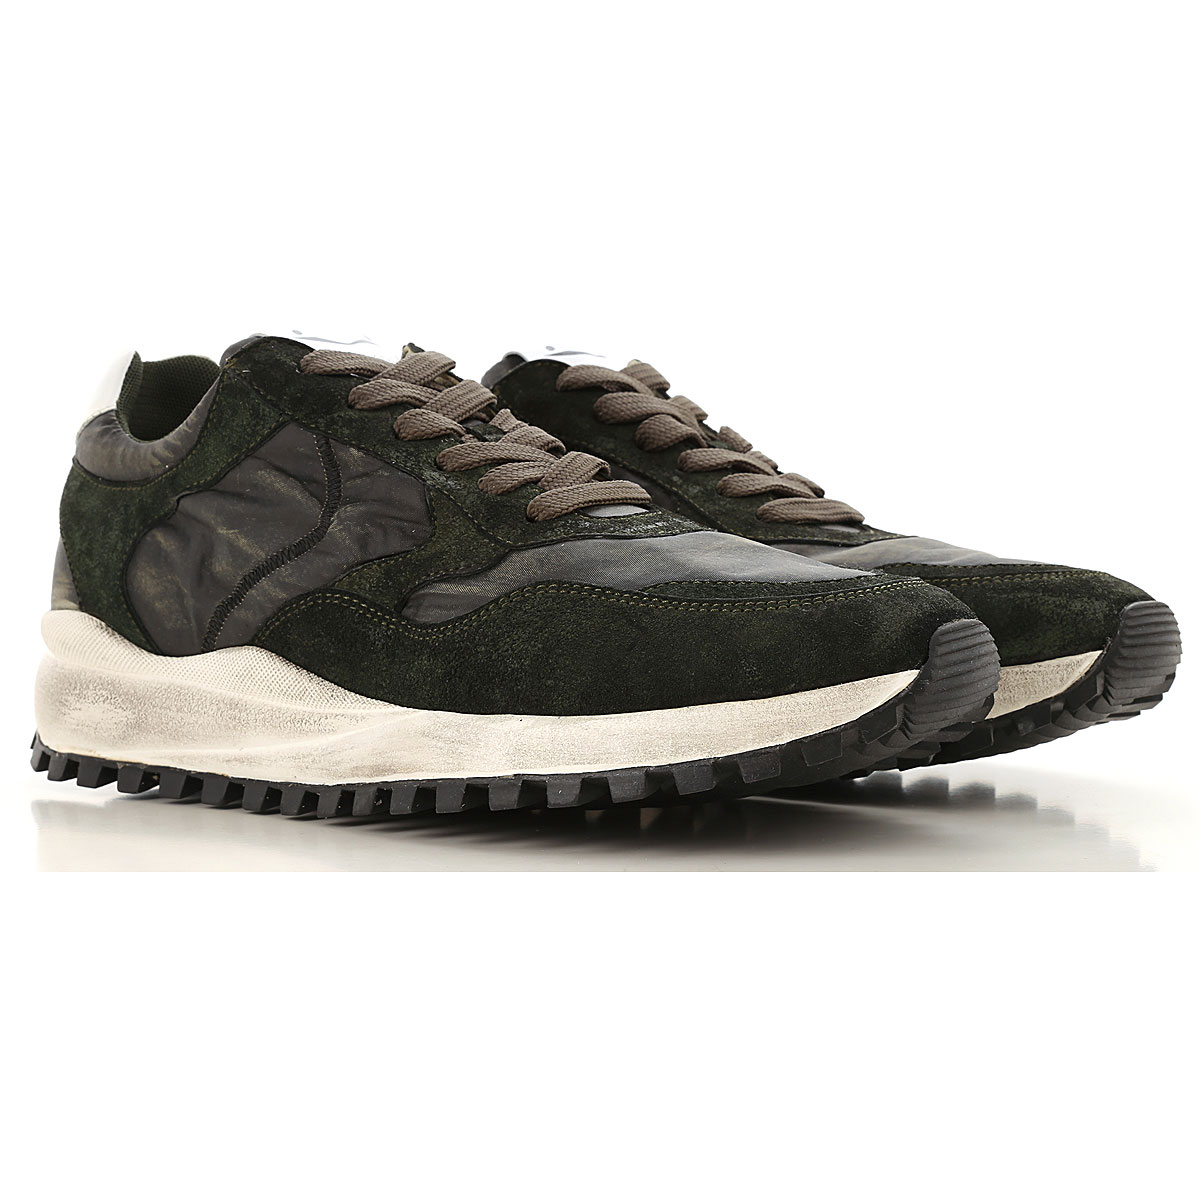 Image of Voile Blanche Sneakers for Men, Dark Green, Nylon, 2017, 10 10.5 7.5 8 9